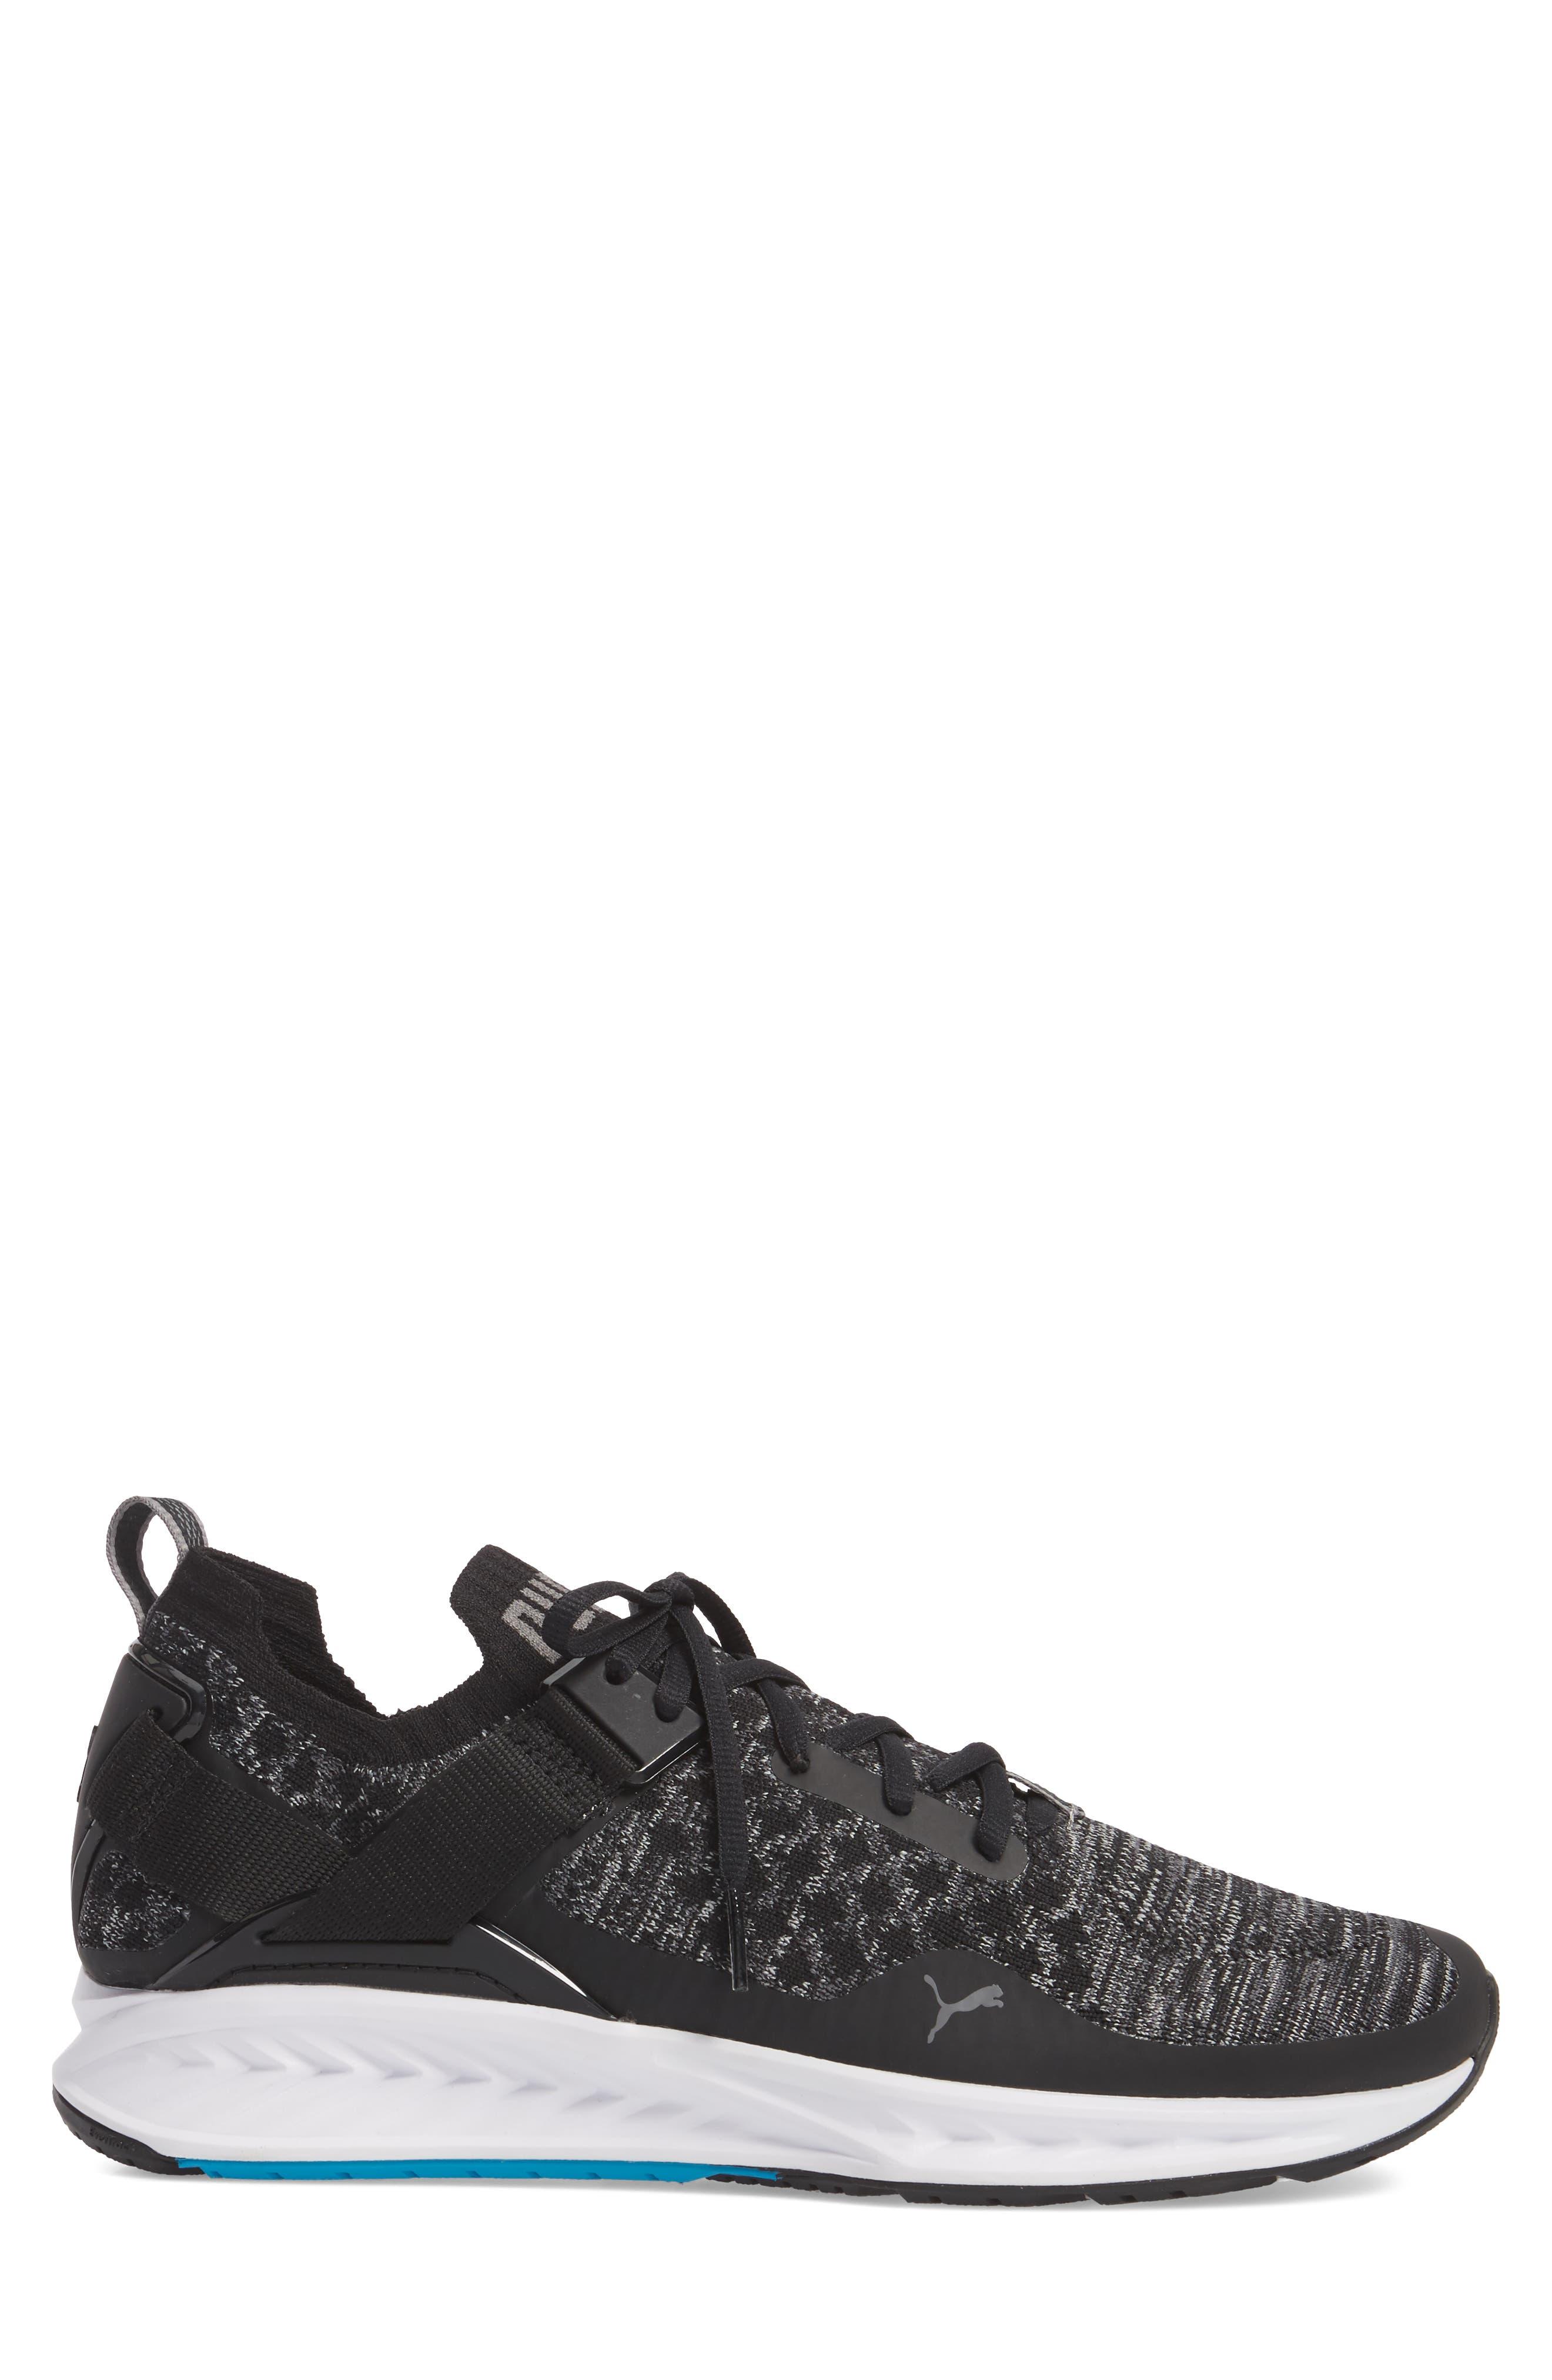 Alternate Image 3  - PUMA IGNITE evoKNIT Lo Training Shoe (Men)